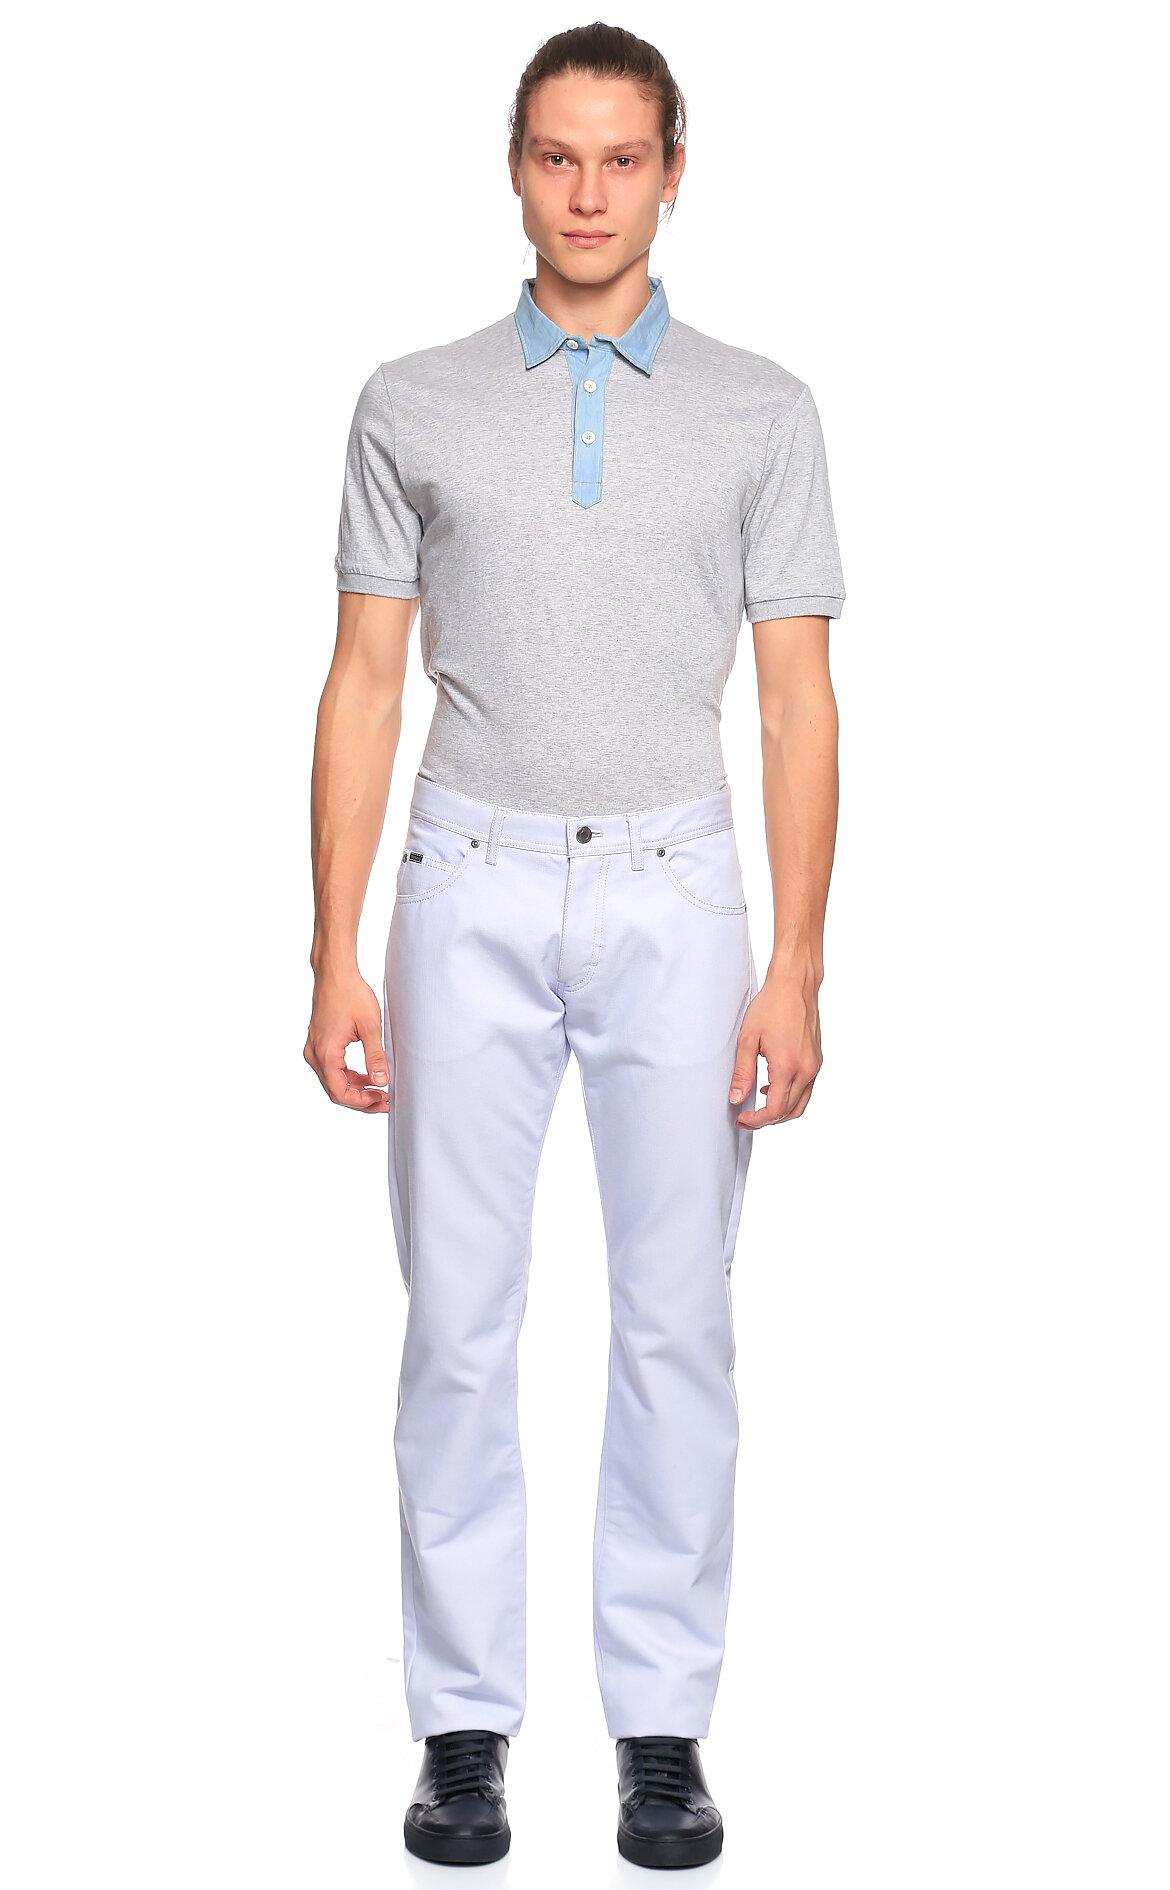 Tom Ford Jean Mavi Pantolon